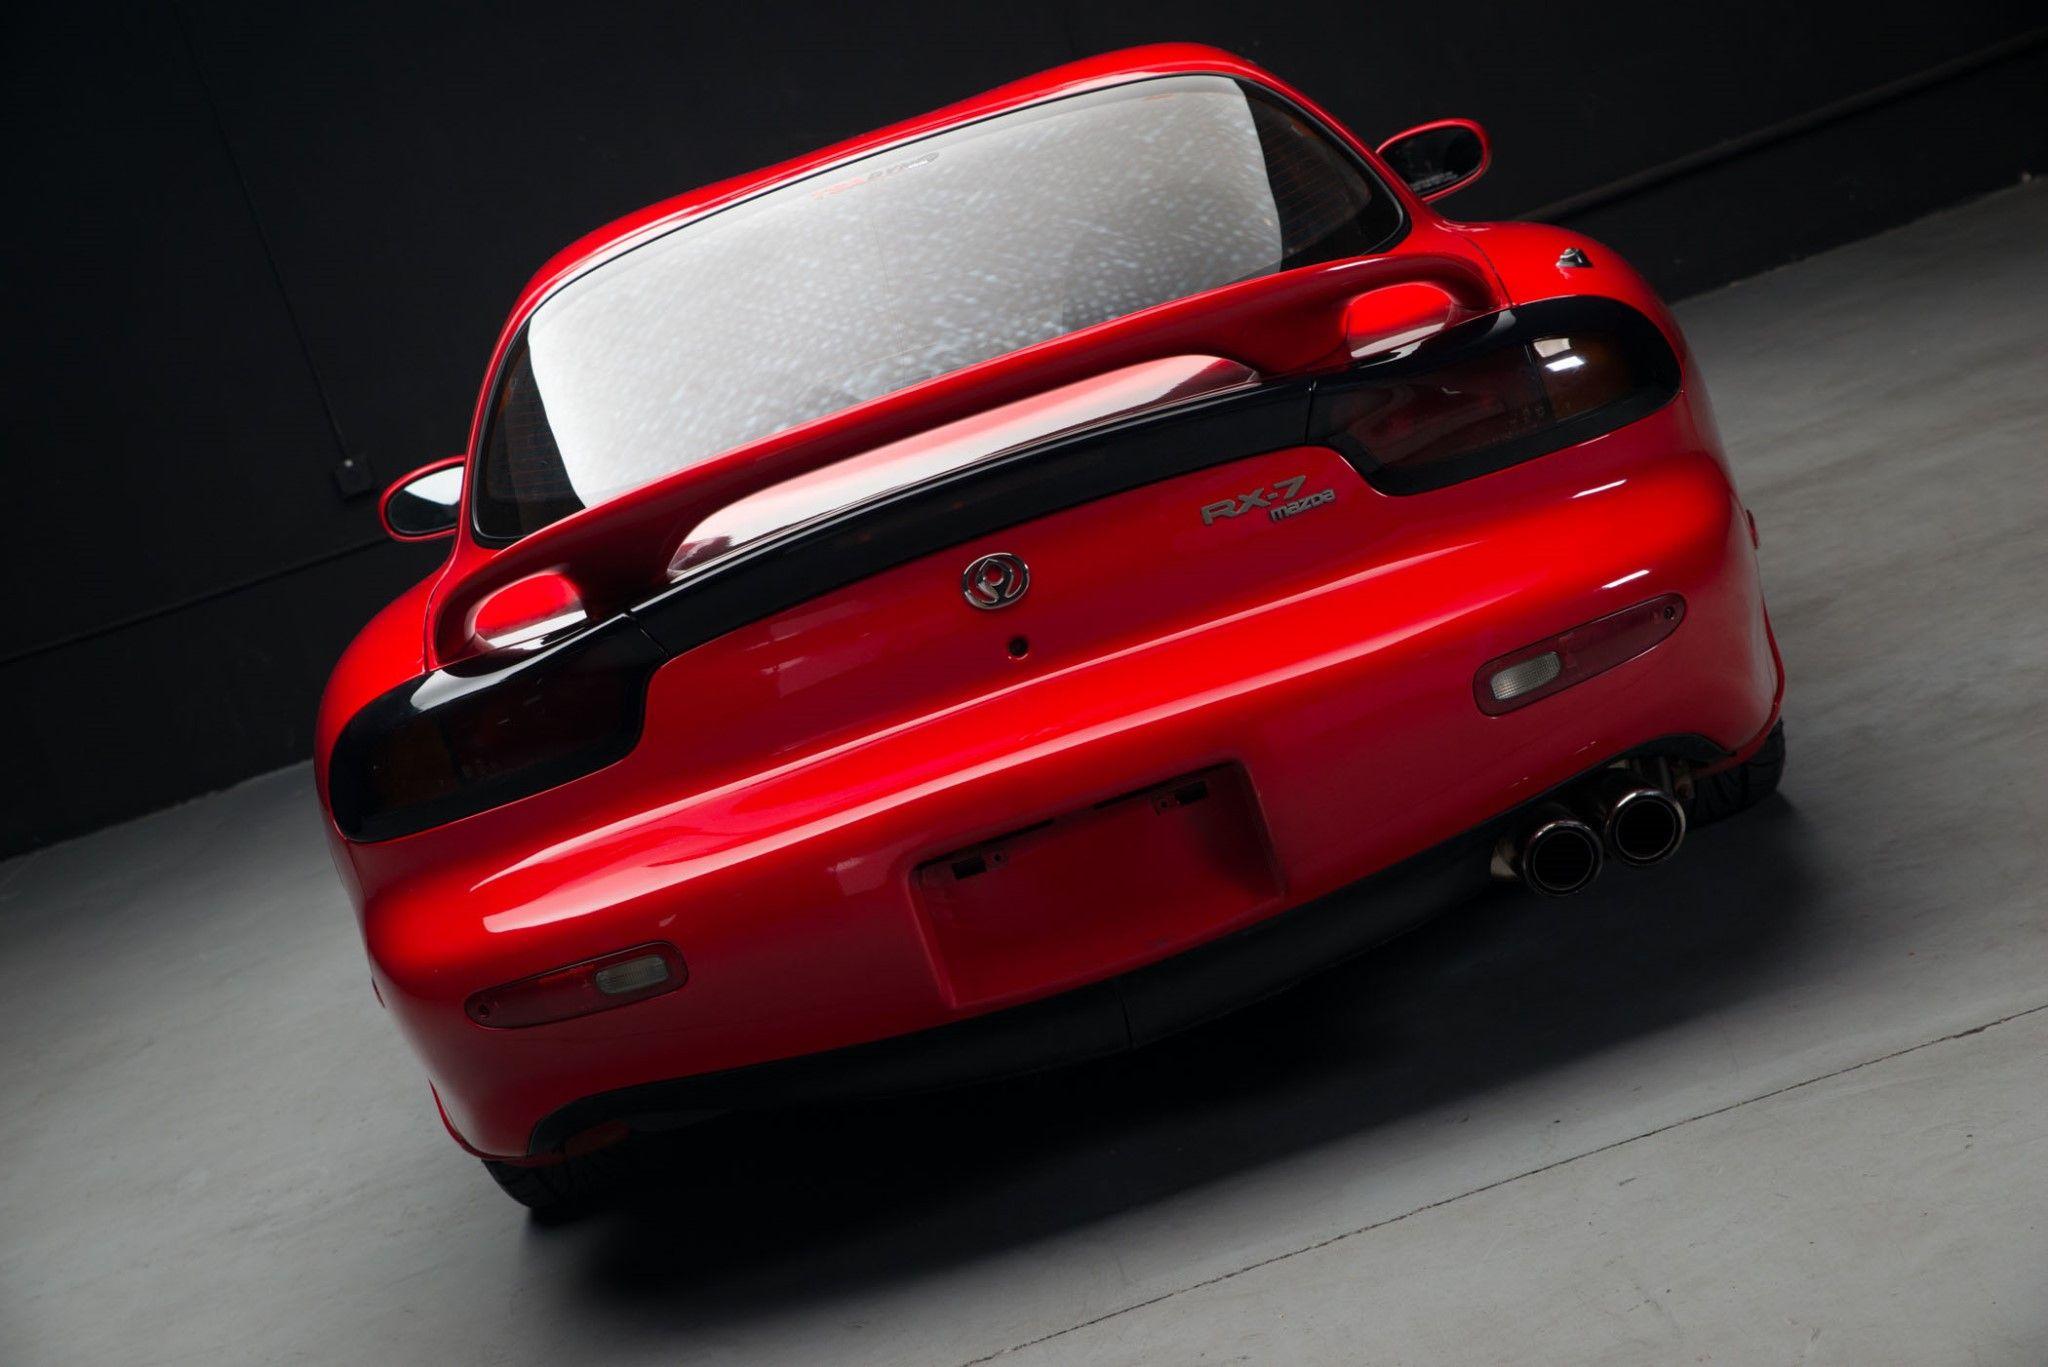 1993 Mazda RX7 R1 ノスタルジー